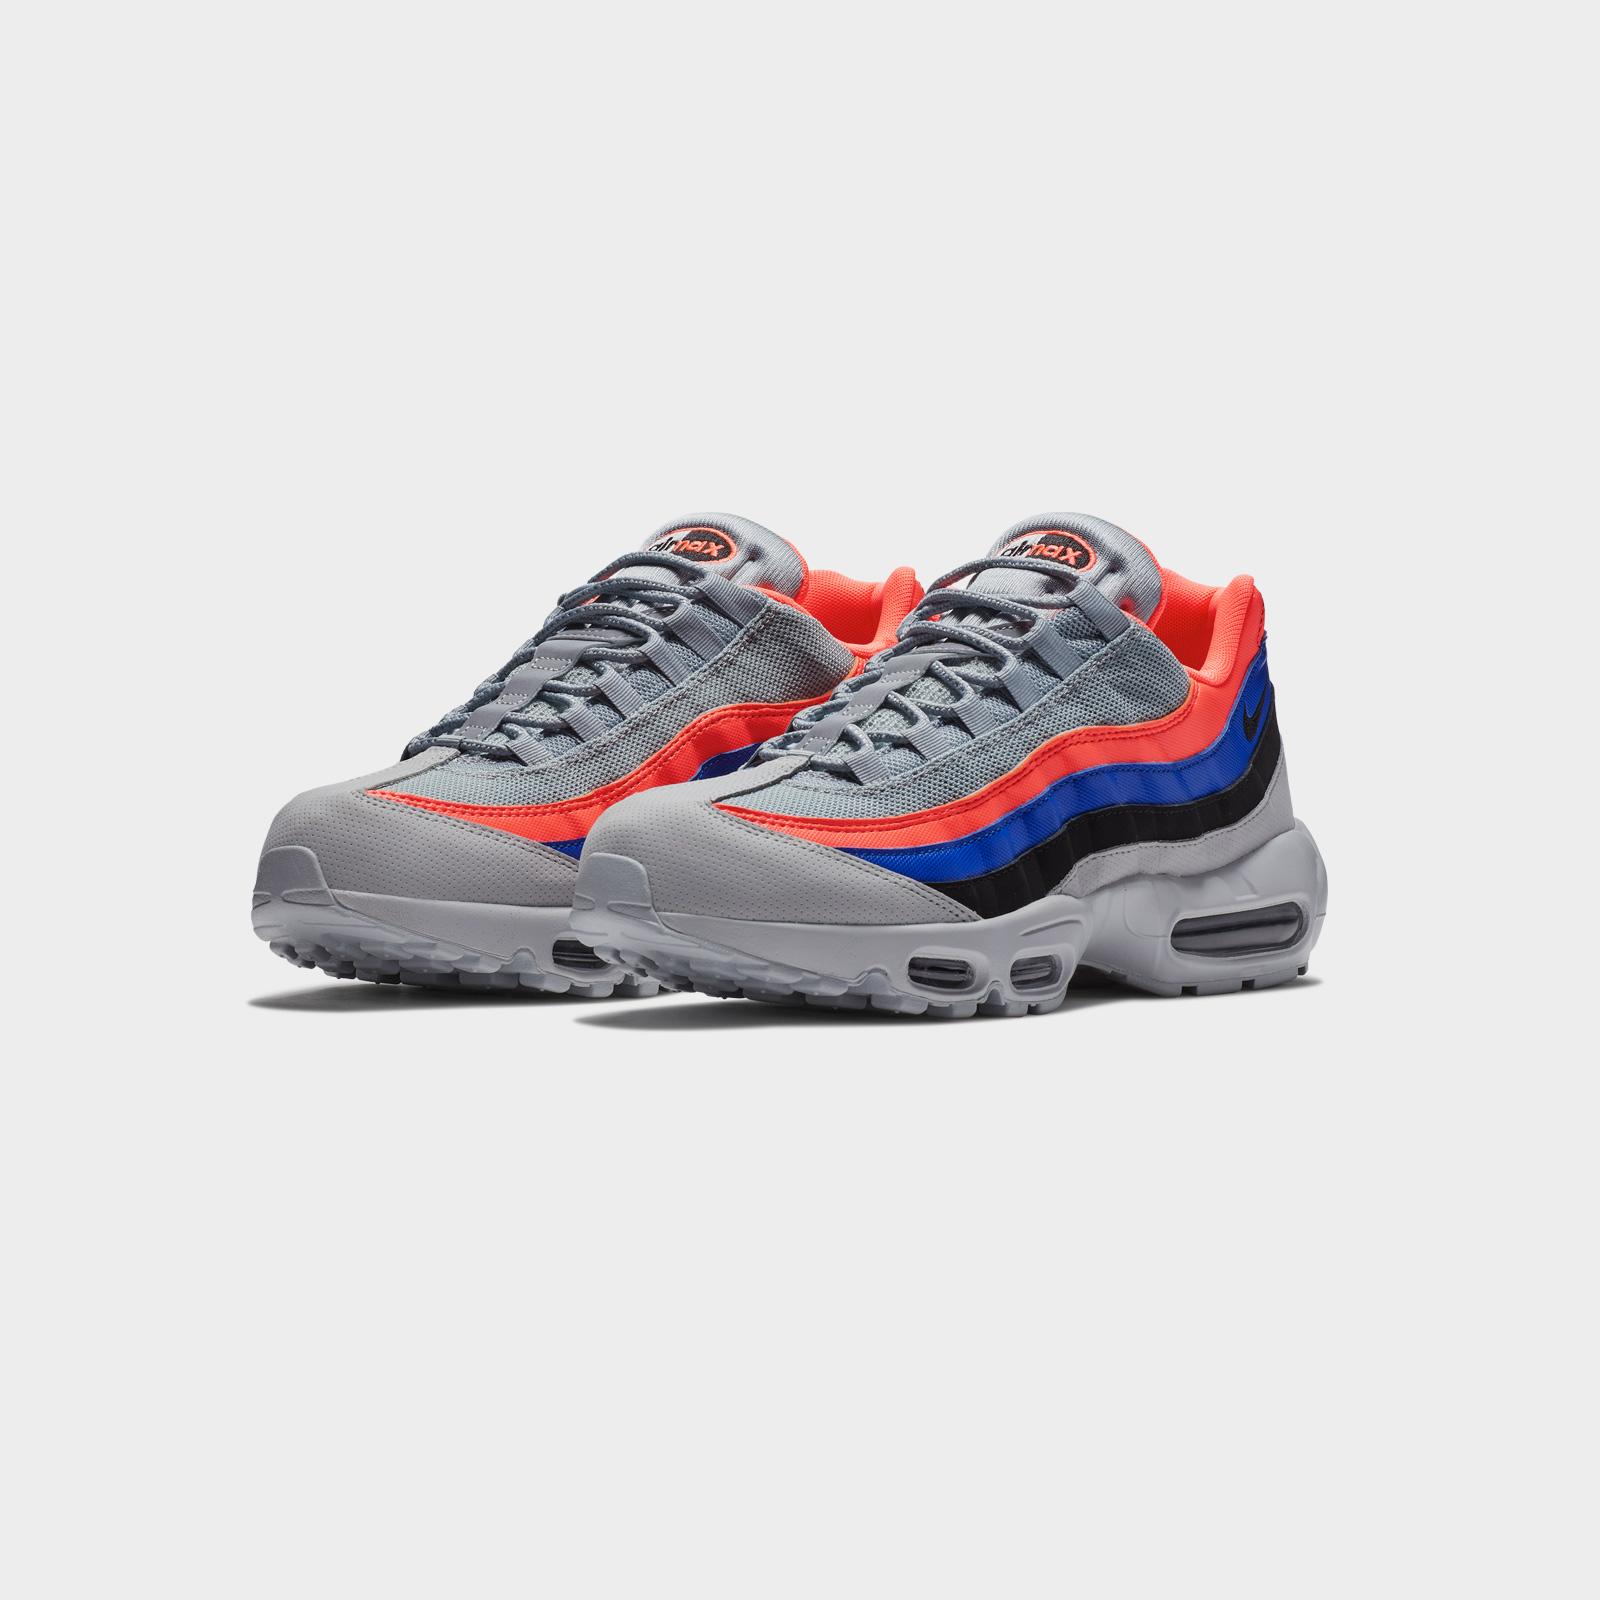 Nike Air Max 95 Essential Grey Black Orange Men | 749766 035